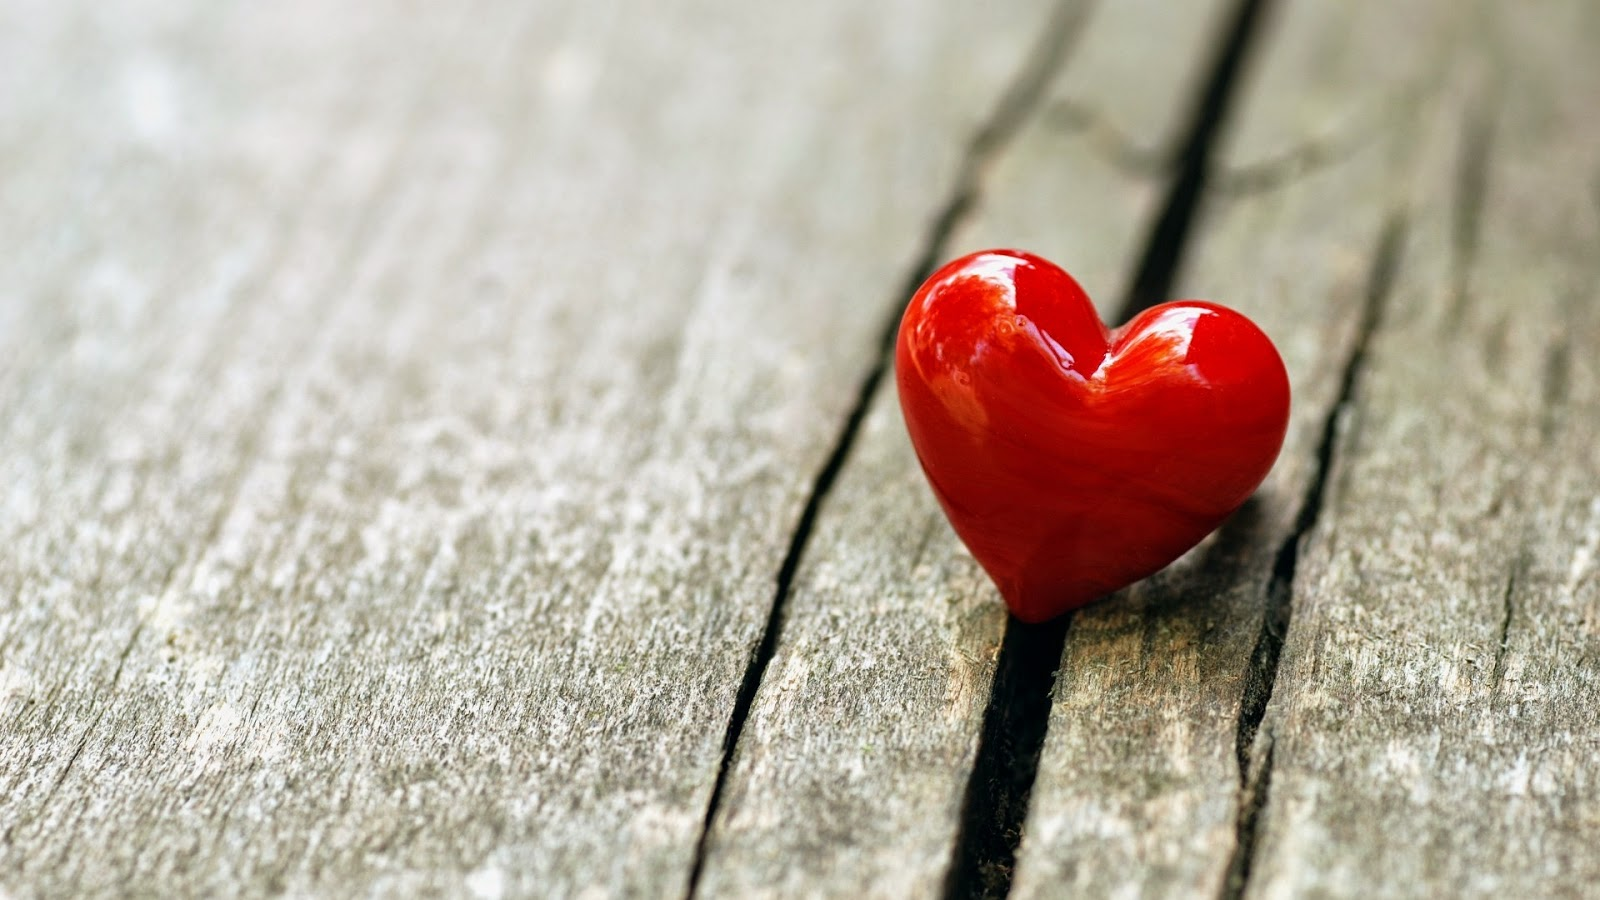 Wallpaper download hd love - Report Love Wallpaper